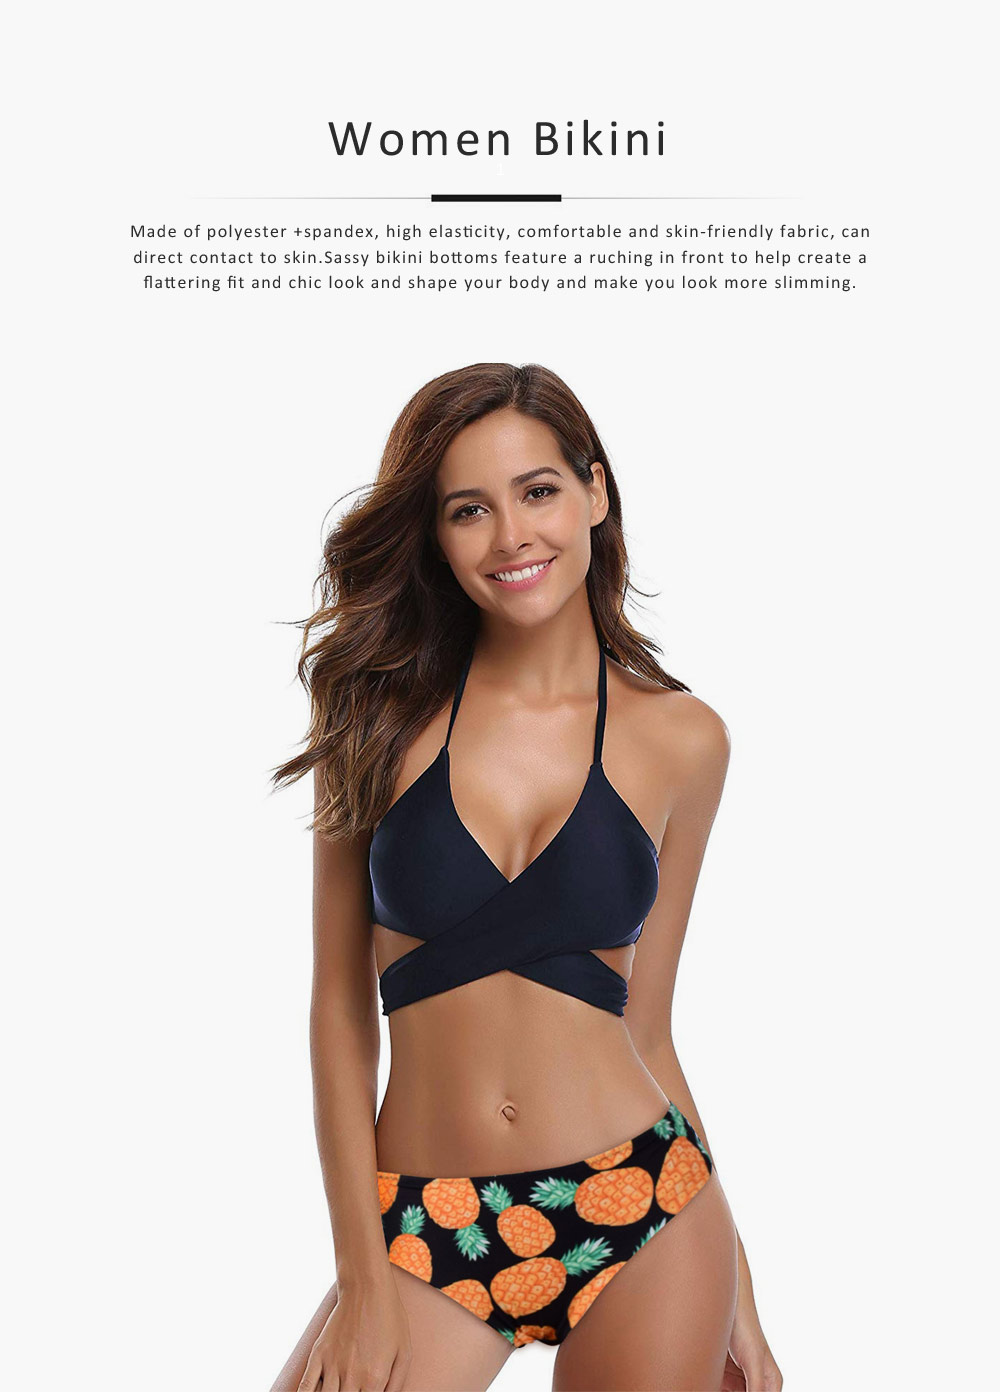 Women's Swimwear V-Neck Sexy Padded Halter Bandage Bikini Two Piece Swimsuits High Waist Bathing Suit 0